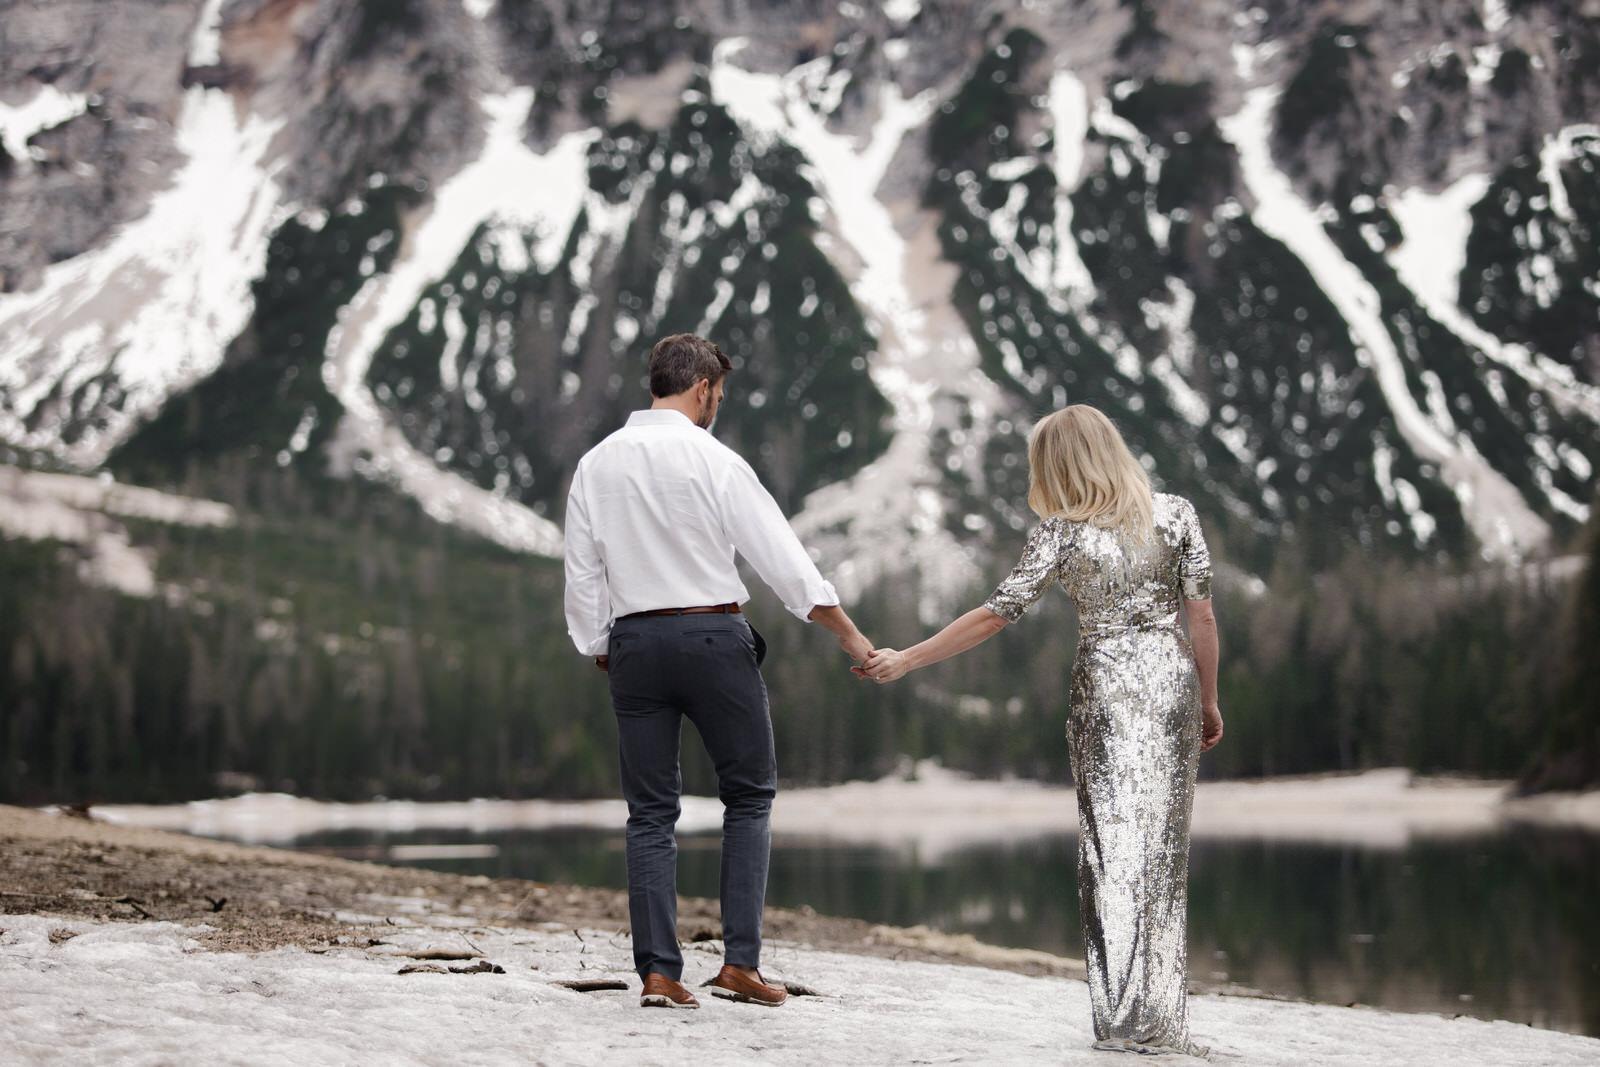 Fotomagoria Dolomites Lago di Braies Photographer 22.jpg